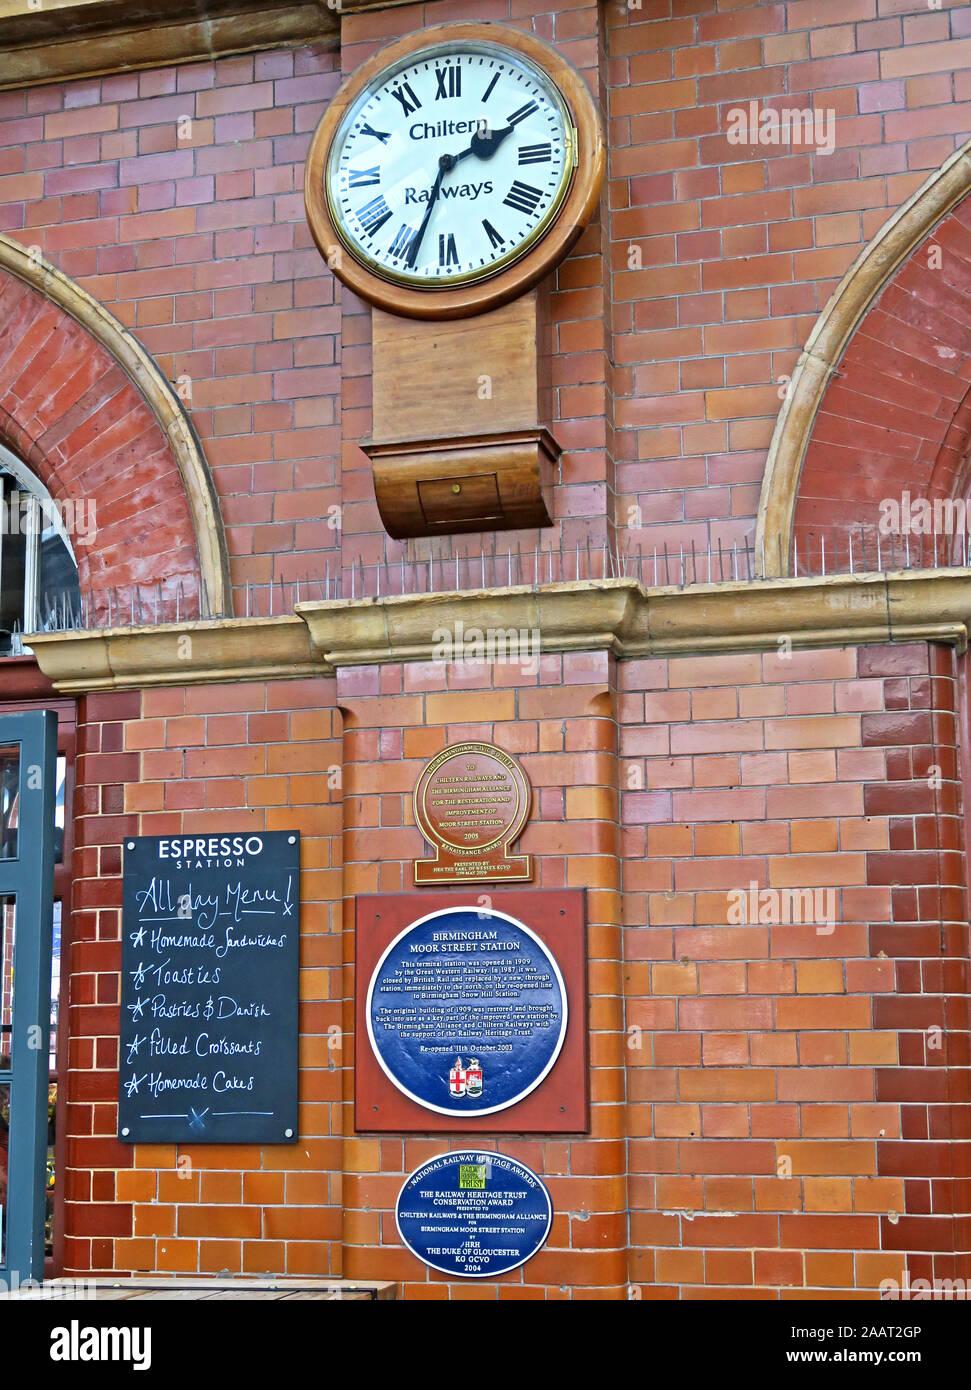 HotpixUk,@HotpixUK,GoTonySmith,UK,England,English,BMO,GWR,City Centre,West Midlands,Historic,transport,architecture,Chiltern Railways Clock,restoration awards,Clock,plaques